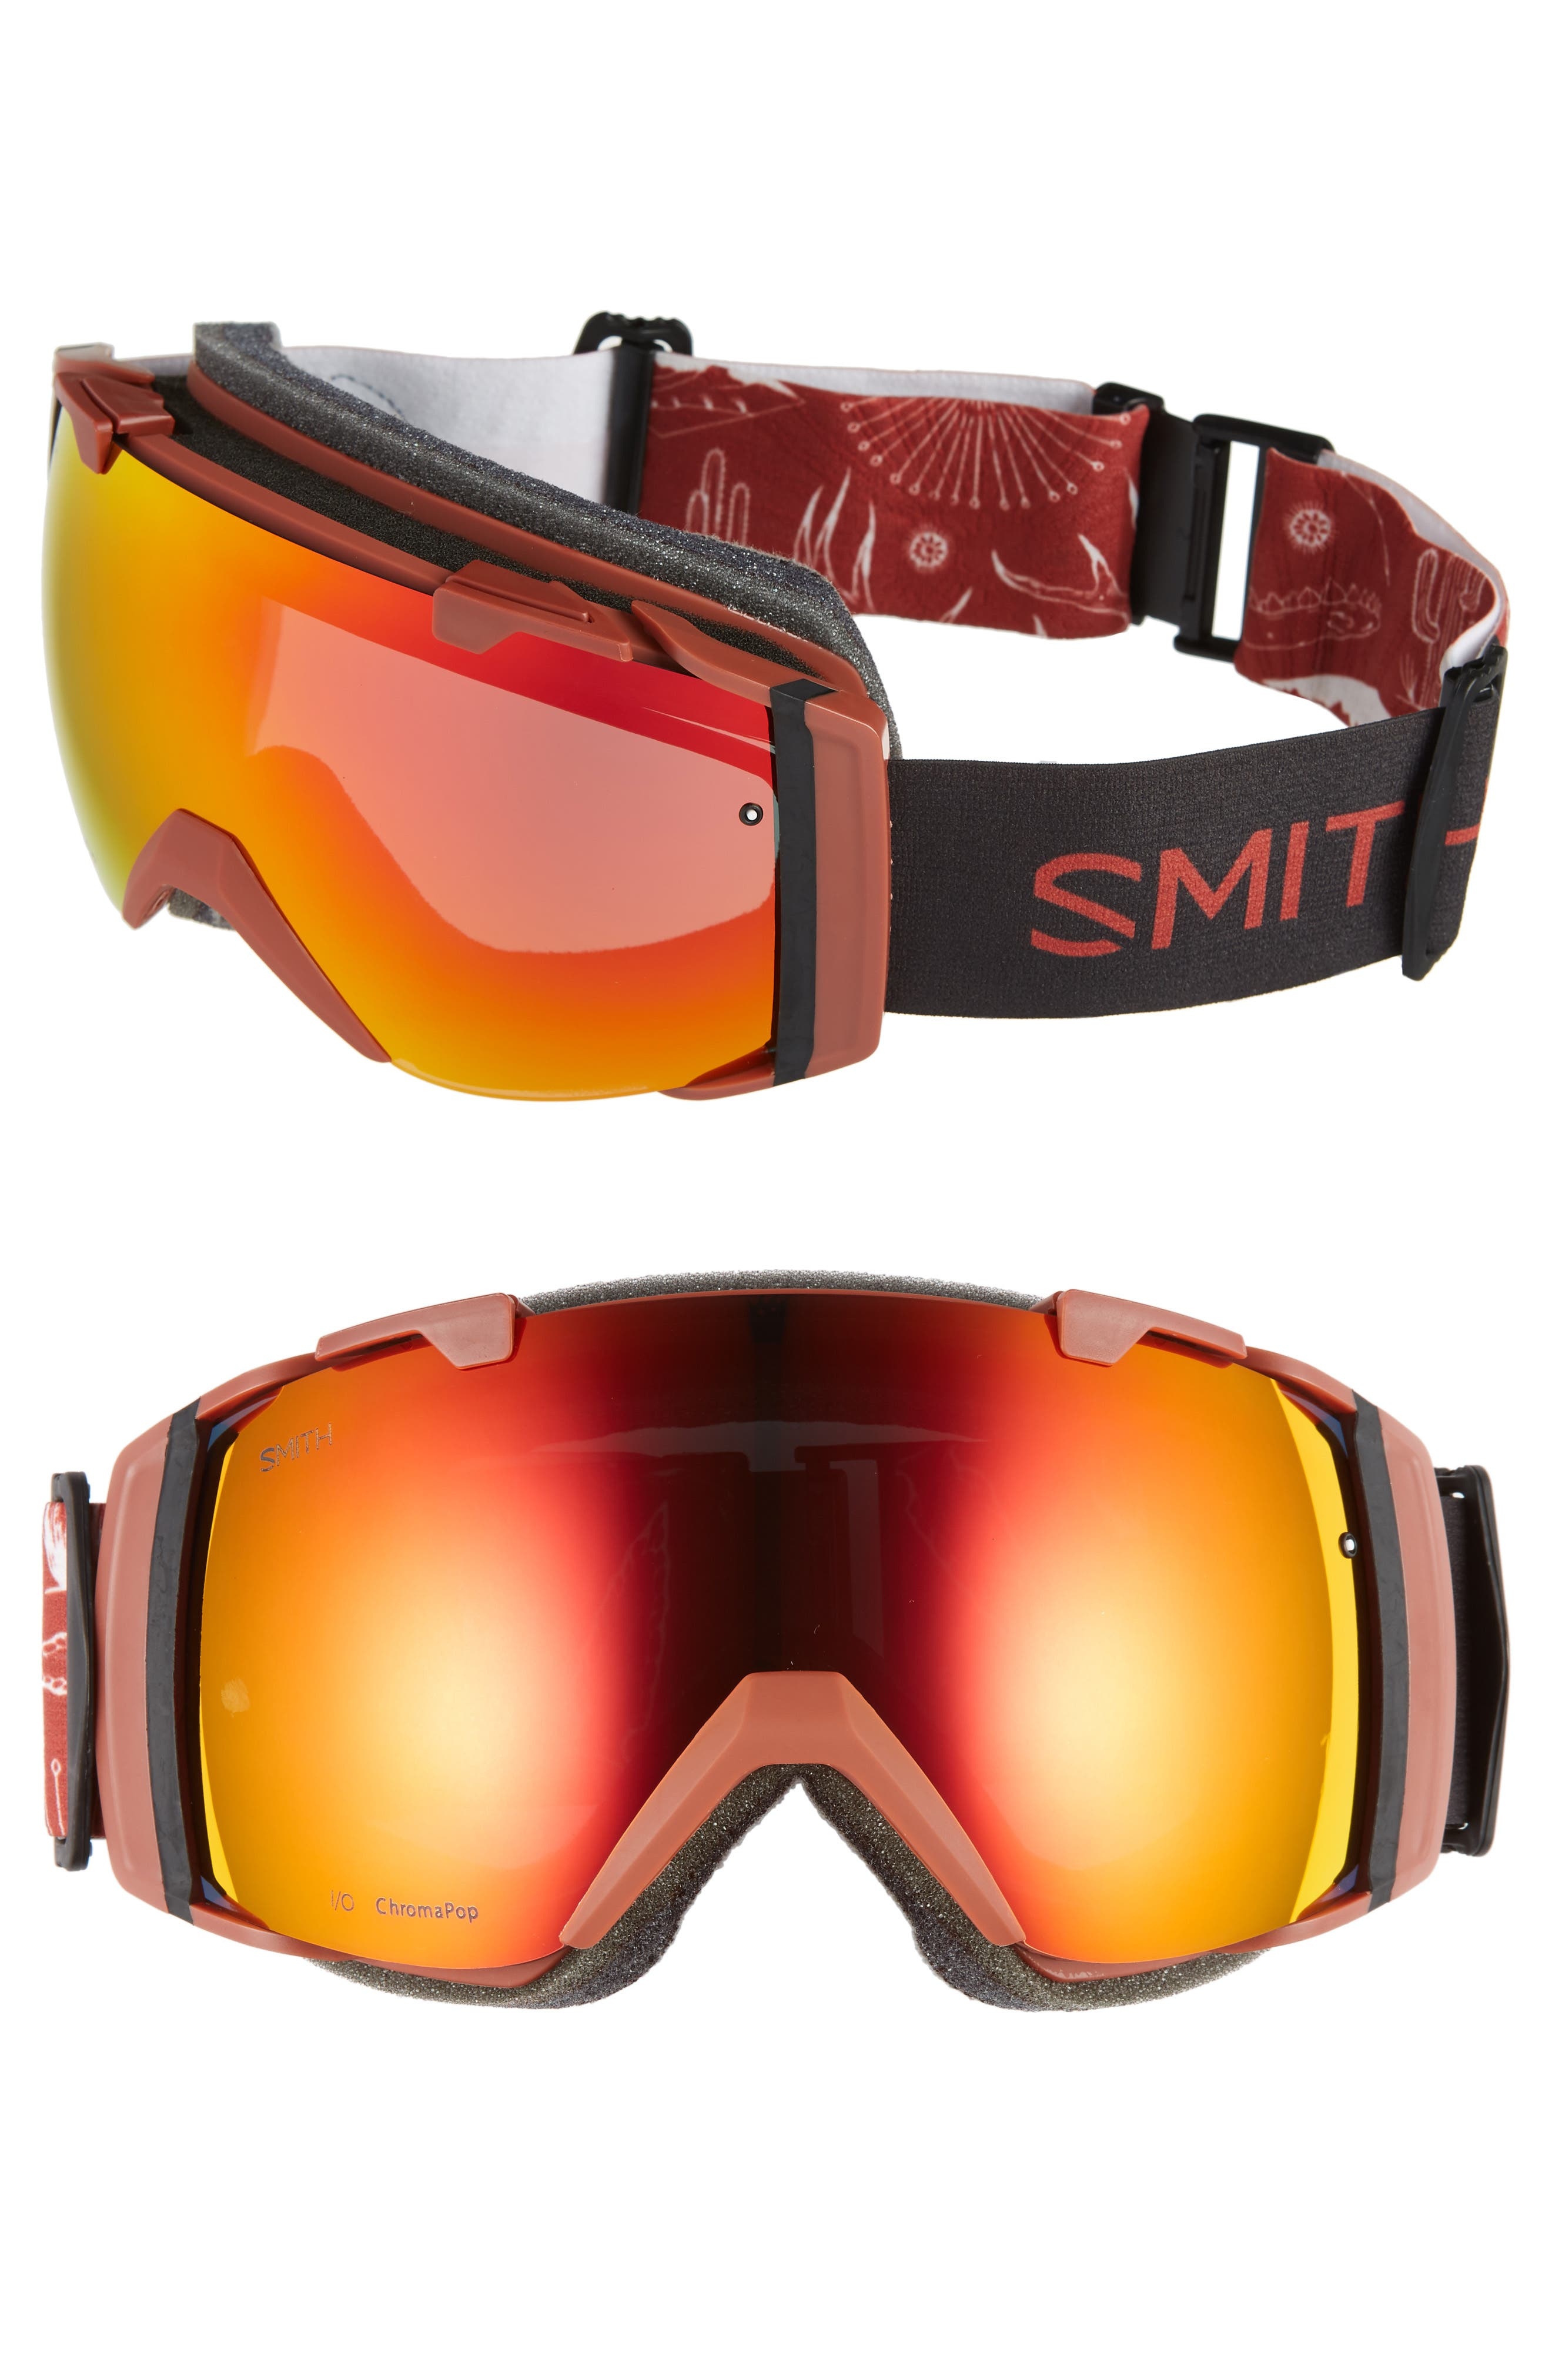 I/O 215mm ChromaPop Snow Goggles,                             Main thumbnail 1, color,                             OXIDE MOJAVE